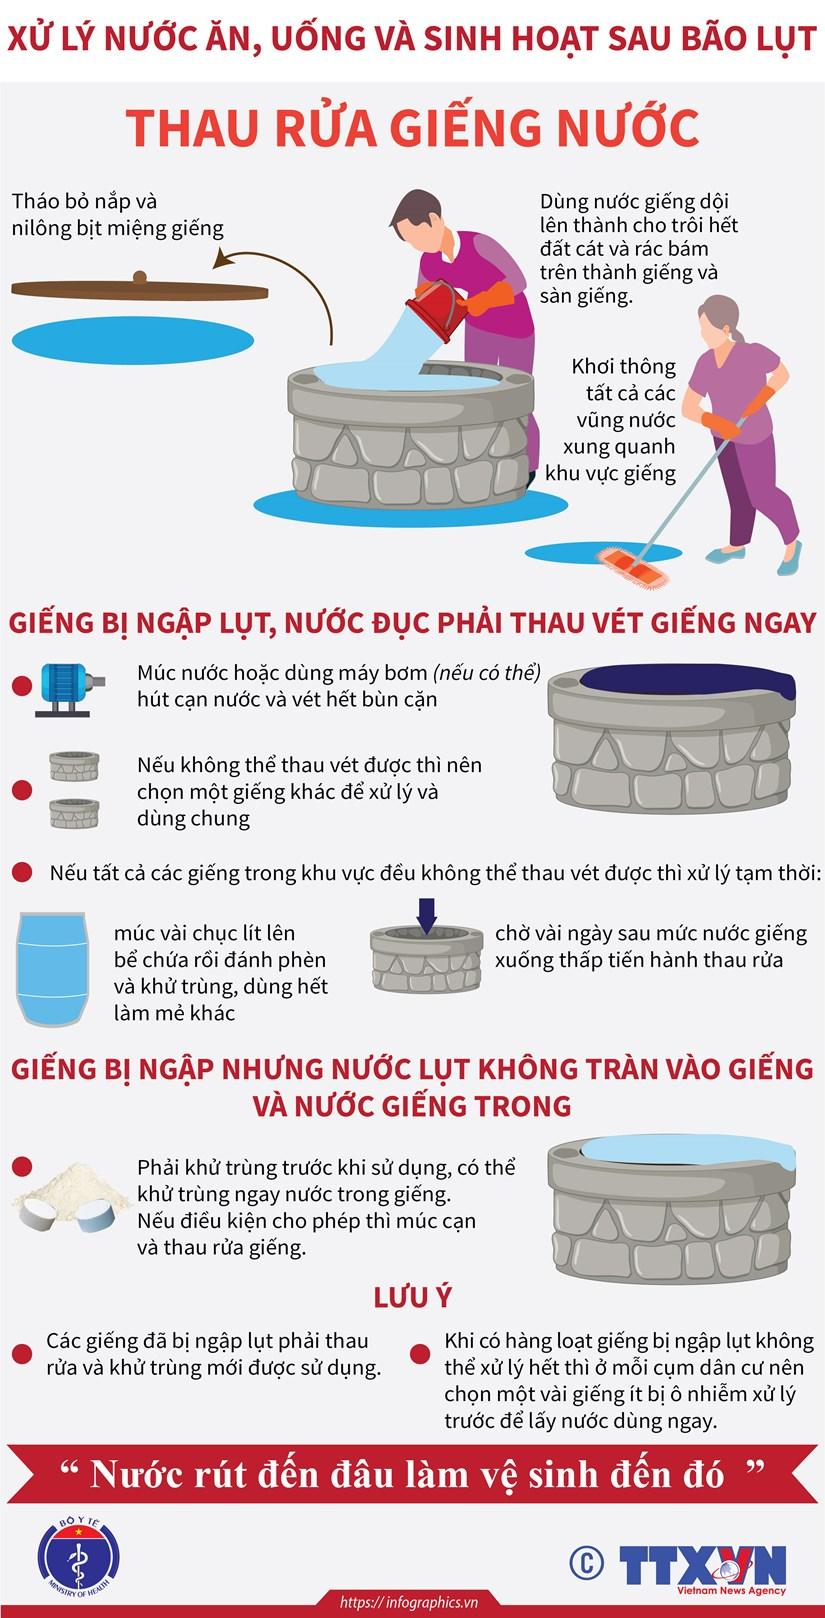 [Infographics] Xu ly nuoc an, uong va sinh hoat sau bao lut hinh anh 2